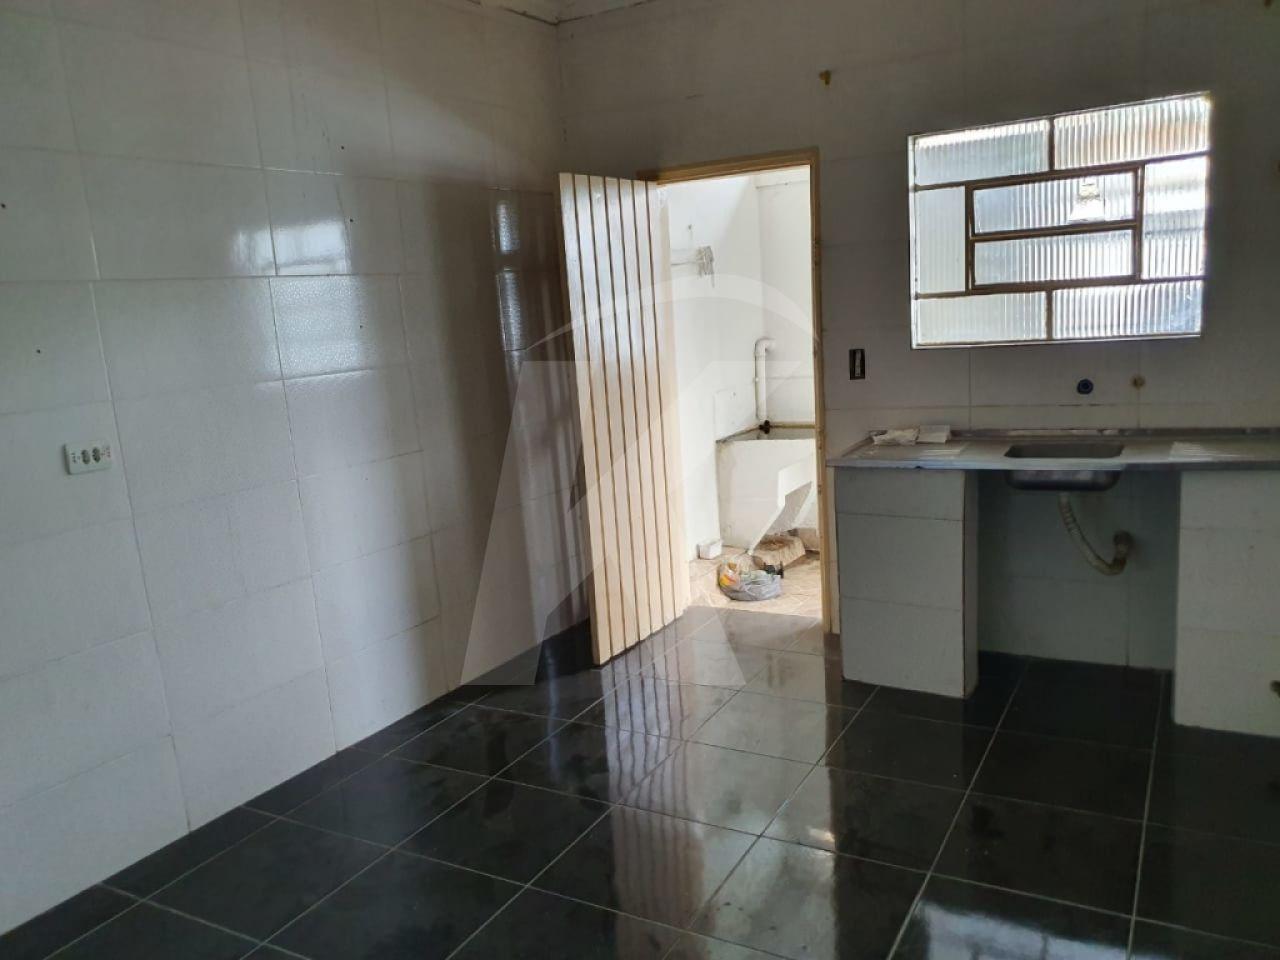 Alugar - Sobrado - Jardim Brasil (Zona Norte) - 1 dormitórios.